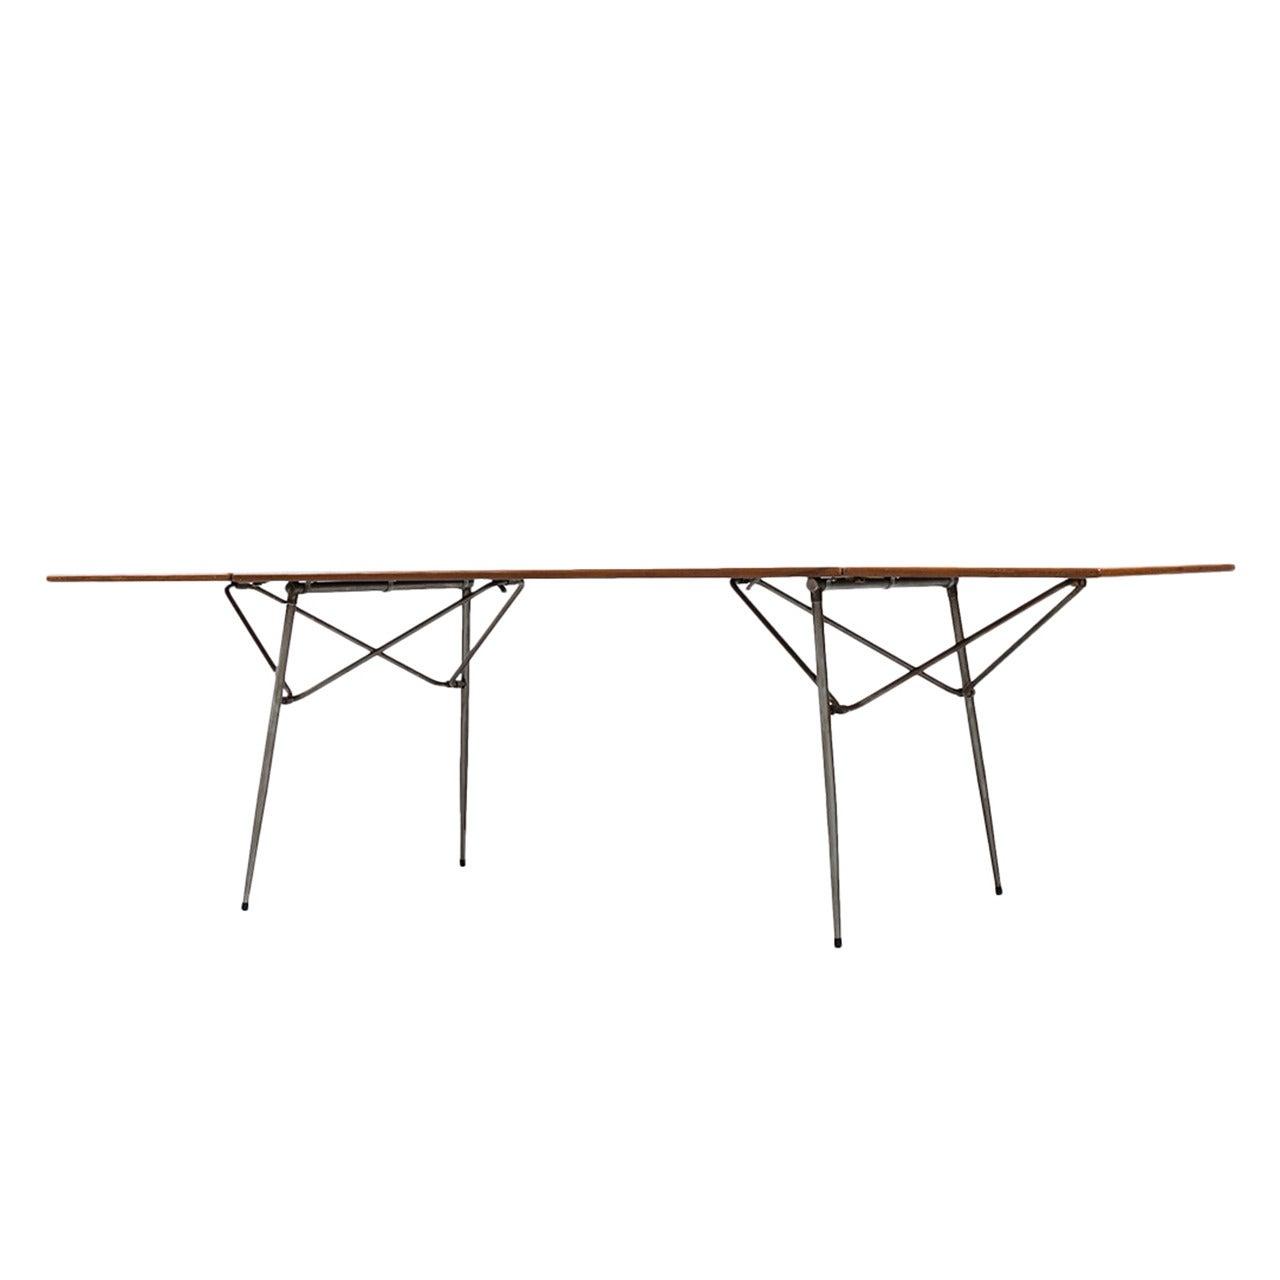 Børge Mogensen Dining Table or Desk by Søborg Møbler in Denmark